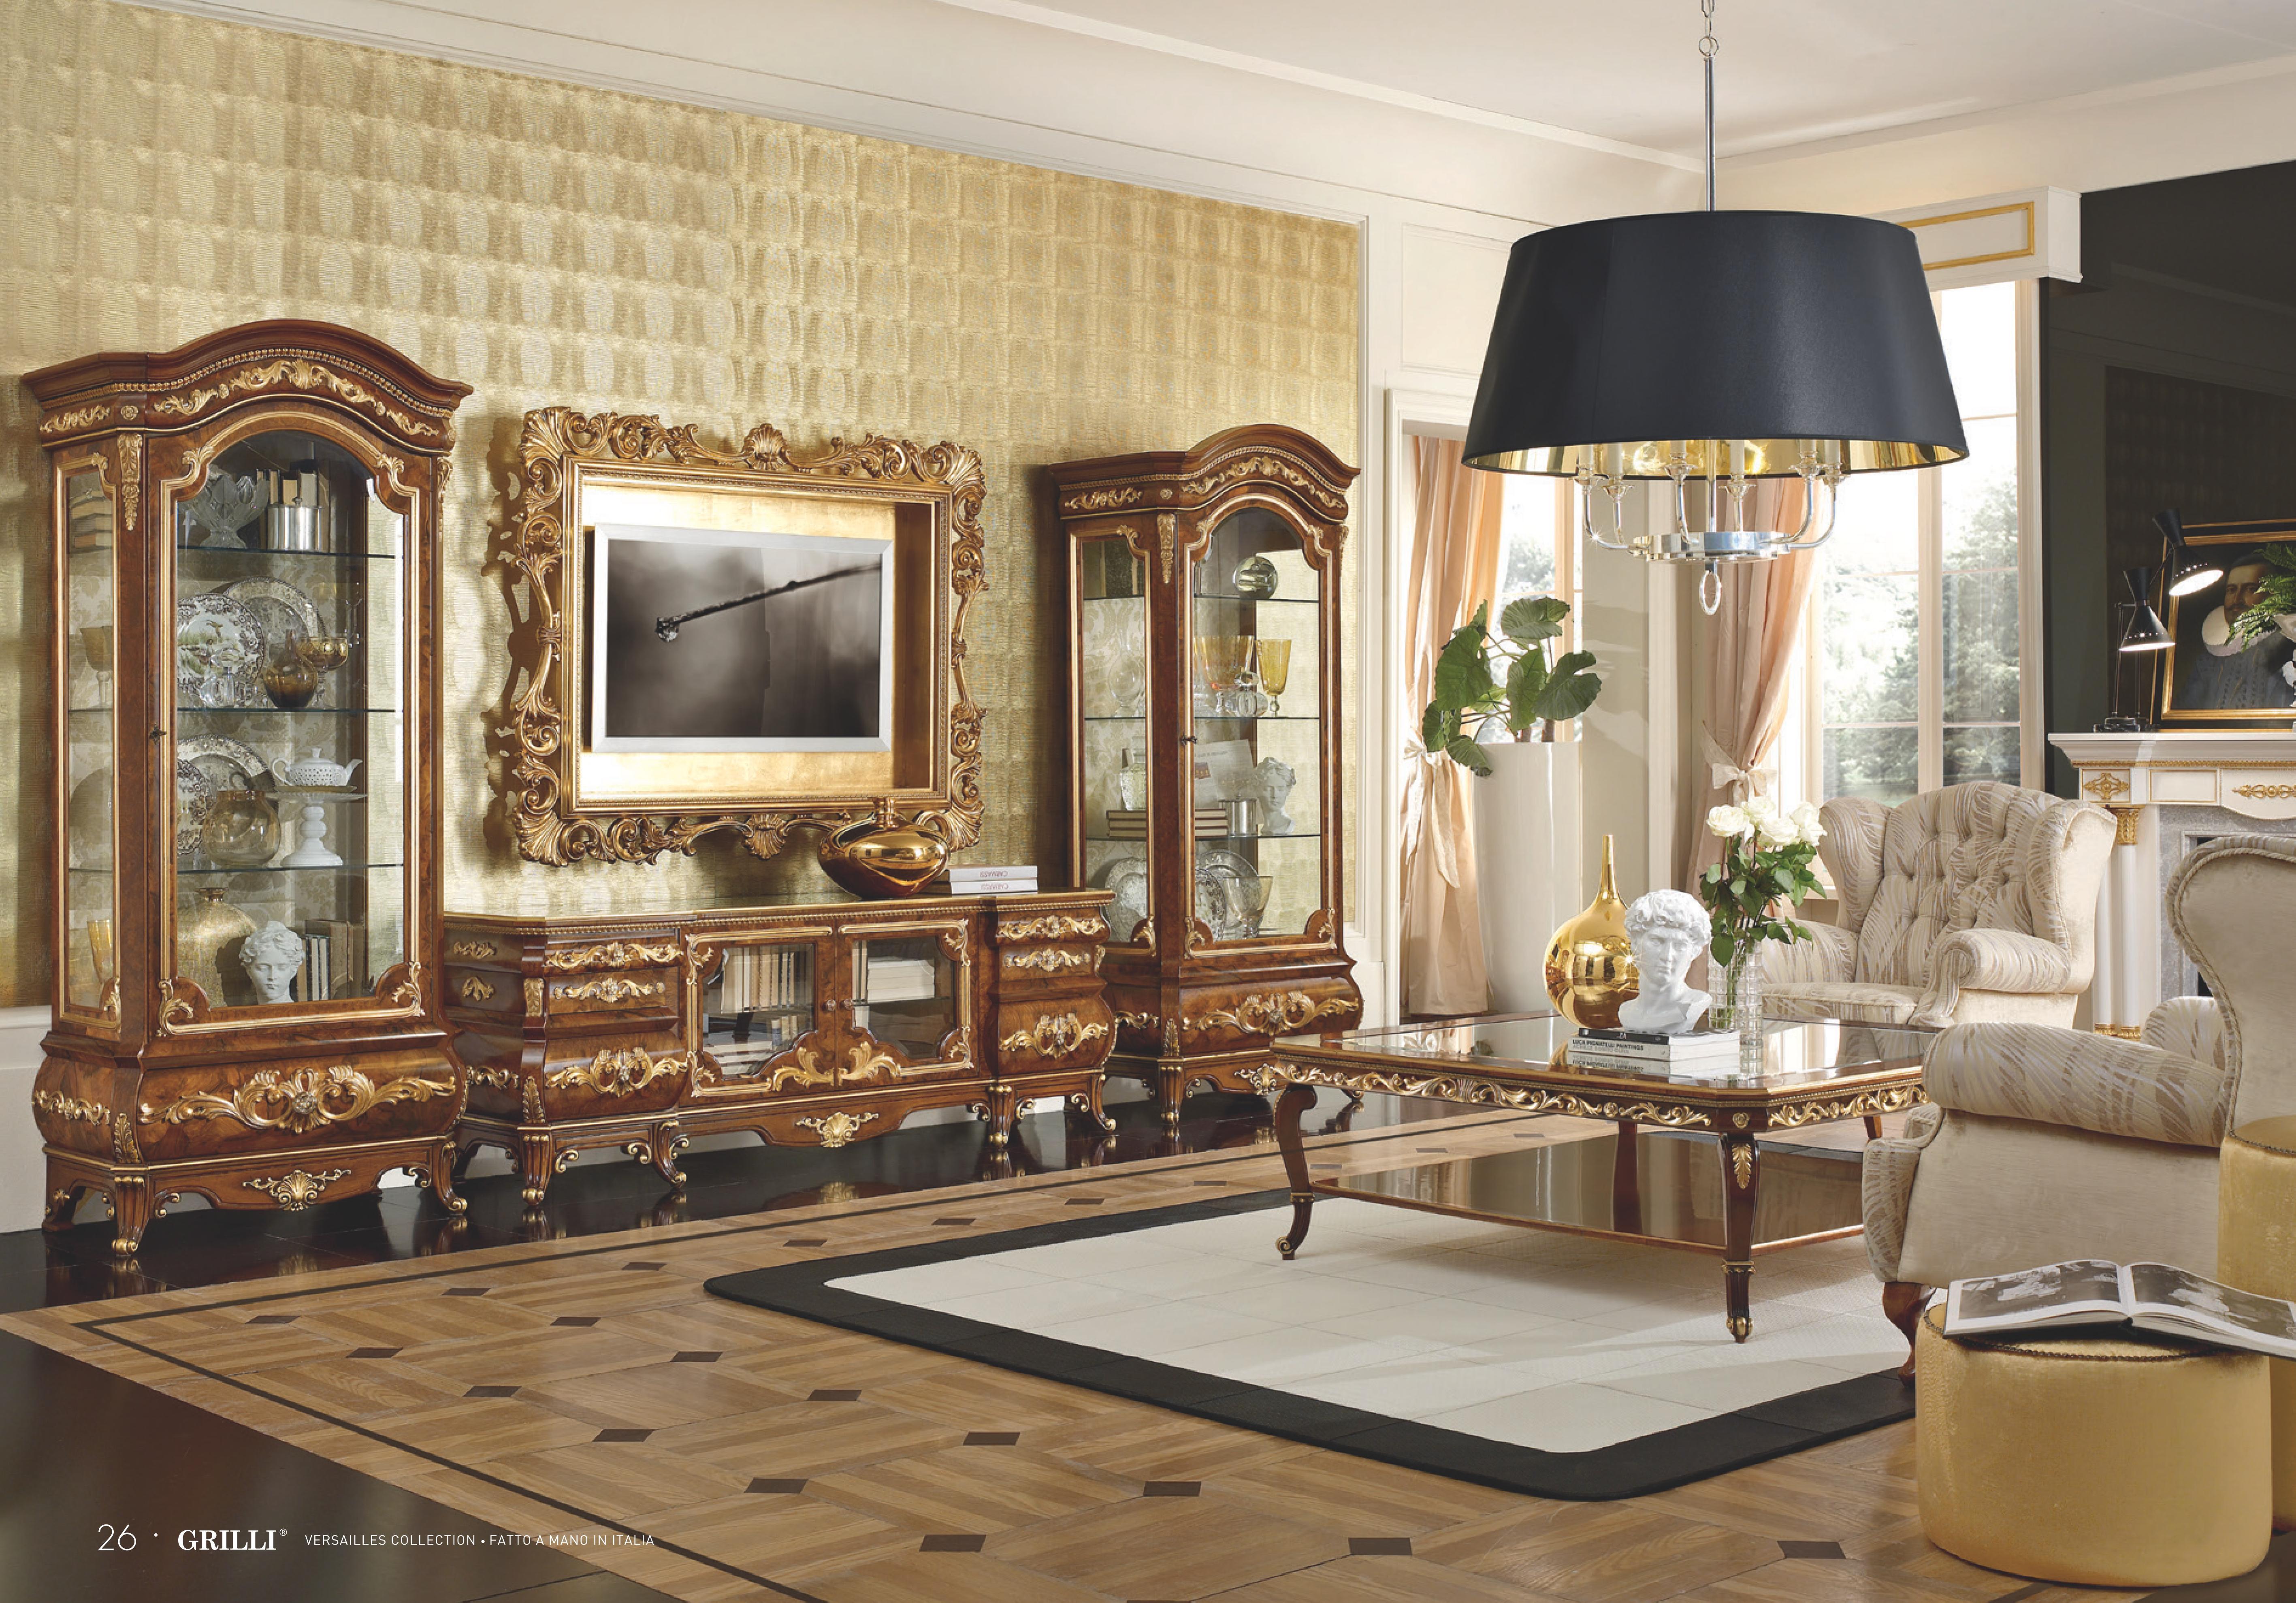 Grilli - Versailles